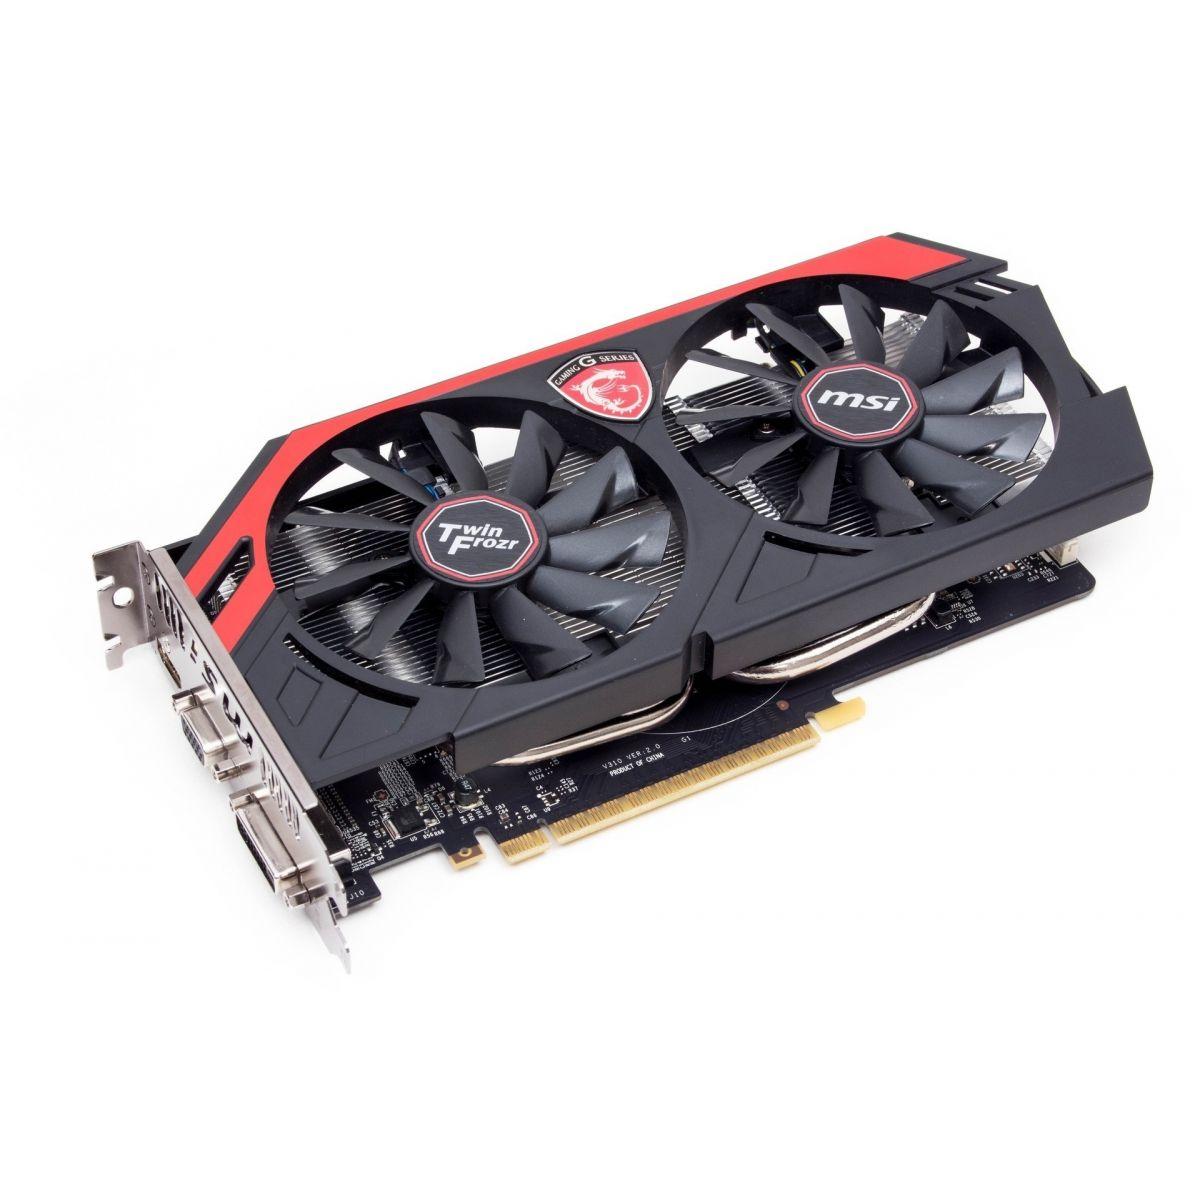 Placa de Vídeo Geforce GTX750Ti OC Edition Twin Gaming 2GB DDR5 128Bit N750Ti TF 2GD5/OC - MSI